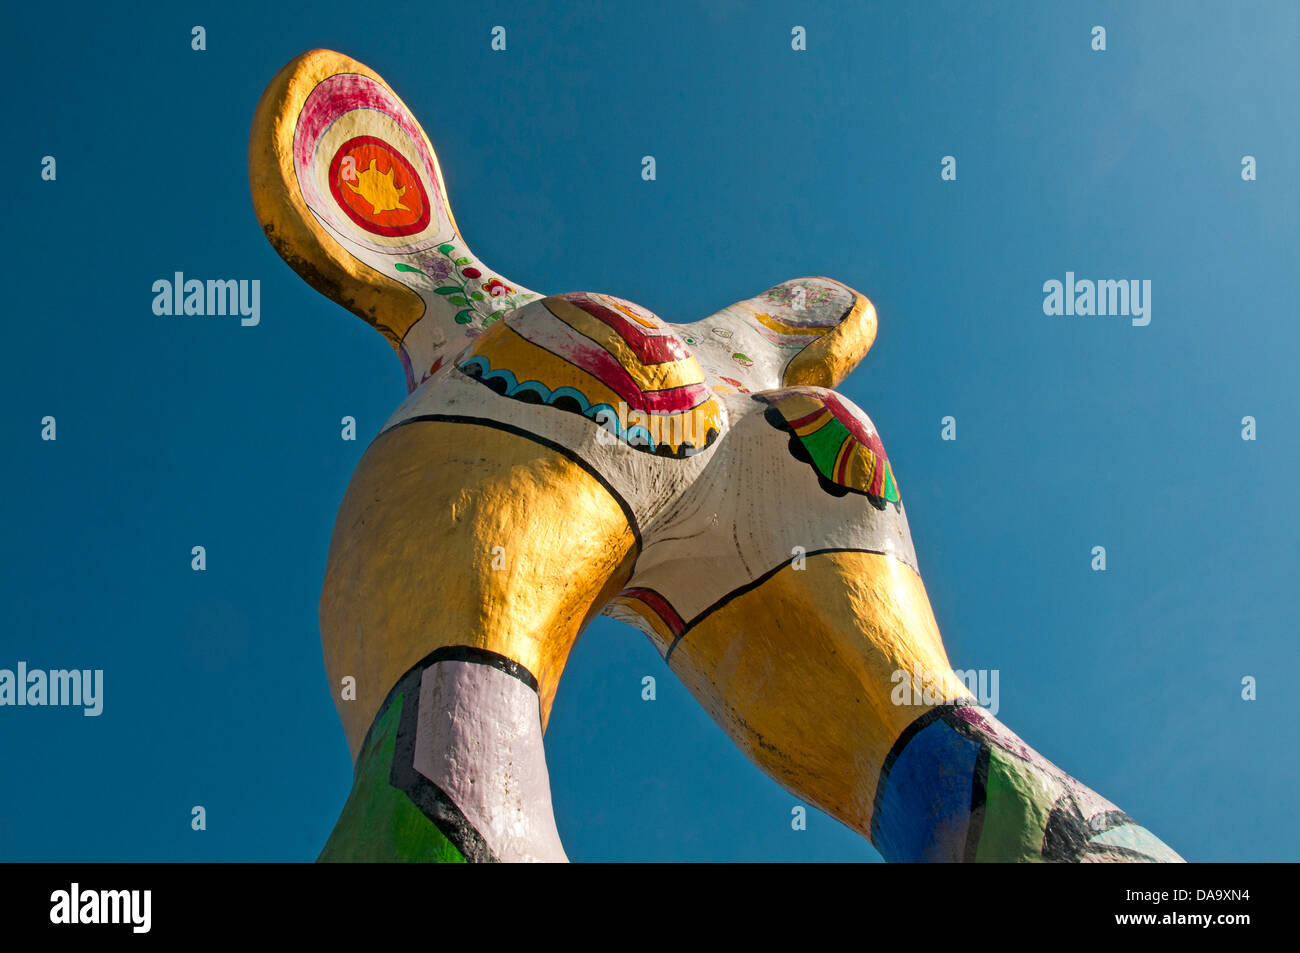 Germany, closer, Europe, muse, Niki de Saint Phalle, sculpture, Ulm, Baden-Wurttemberg, muse - Stock Image